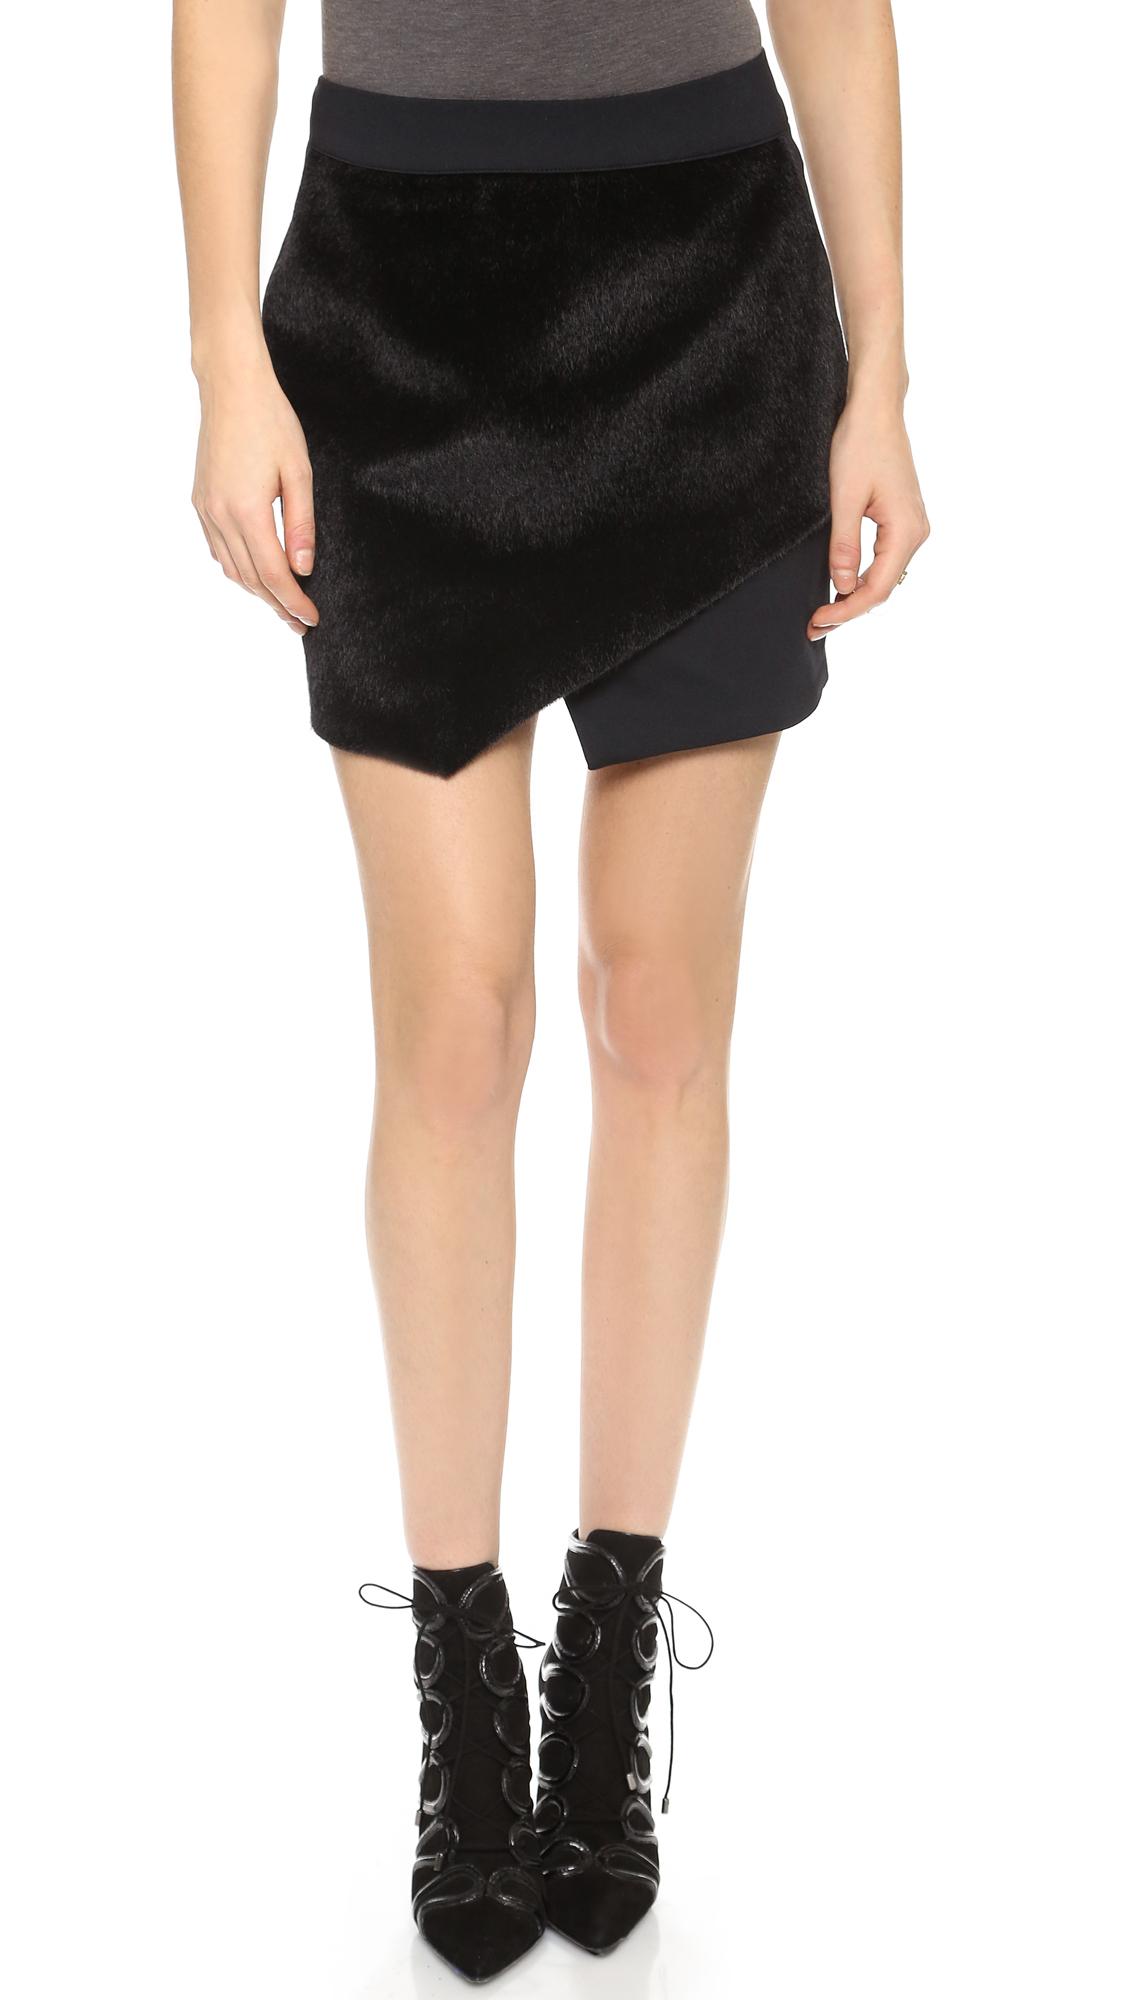 be58981ac598 David Lerner Asymmetrical Skirt - Black in Black - Lyst